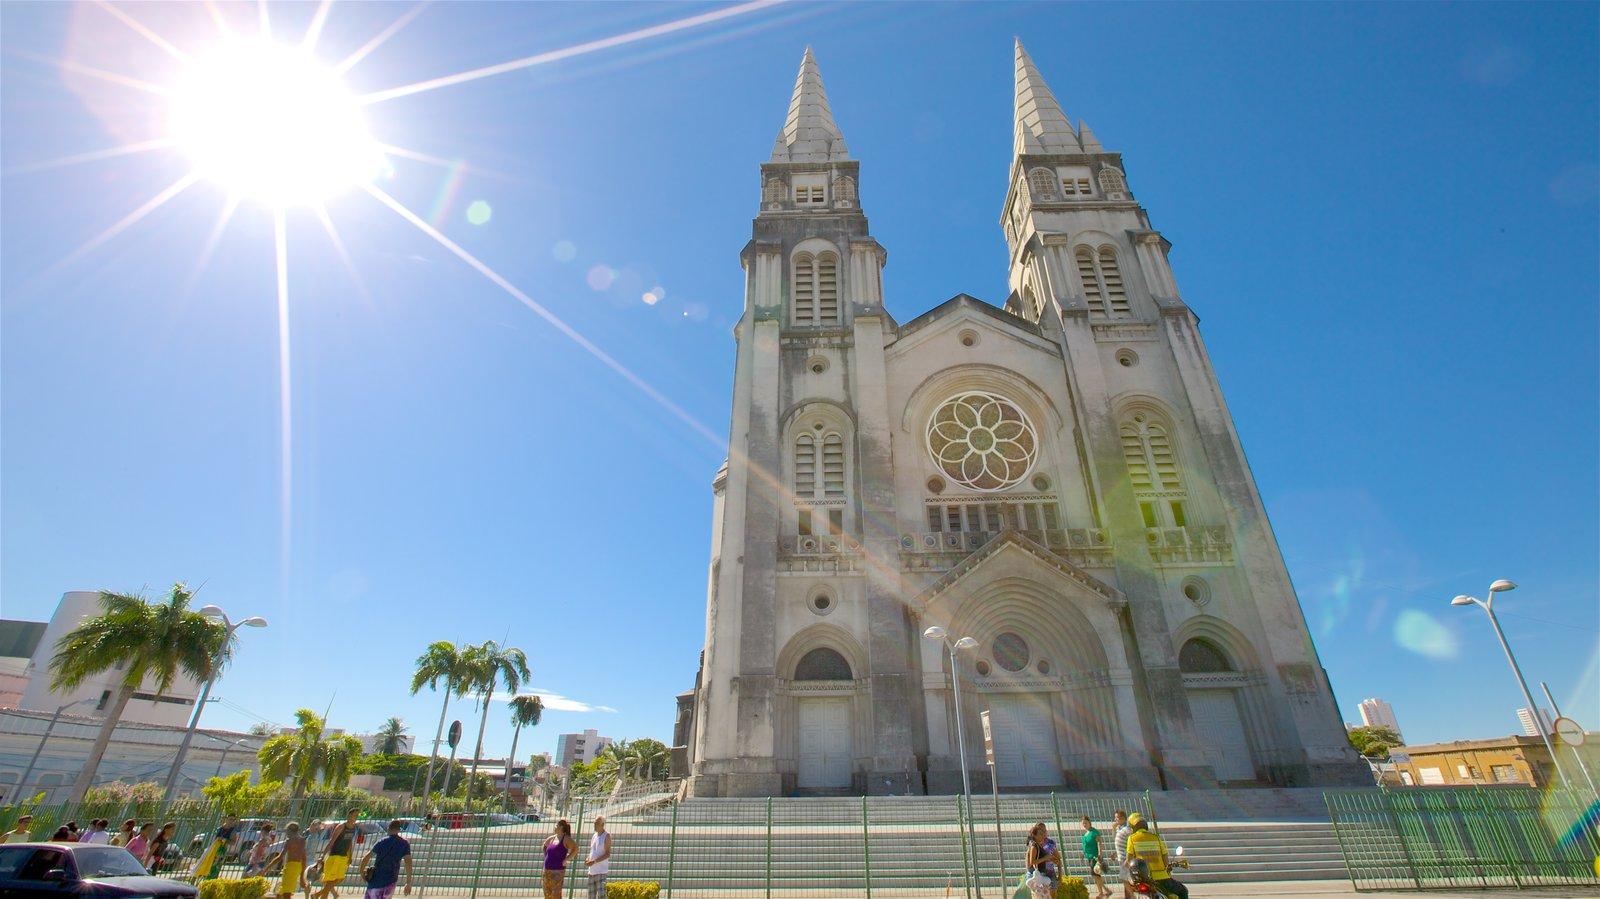 Catedral Metropolitana de Fortaleza caracterizando uma igreja ou catedral e cenas de rua